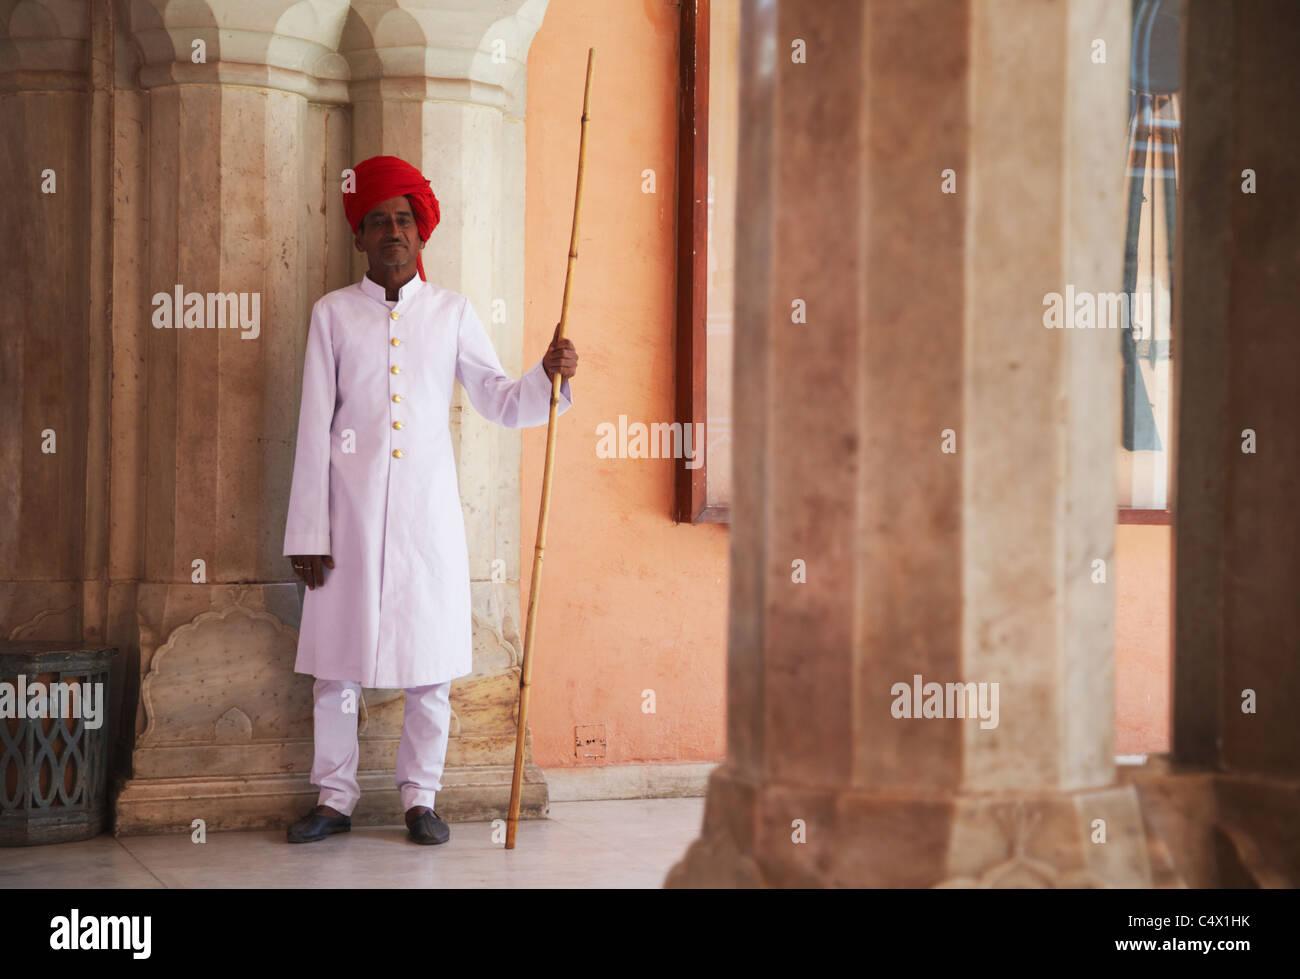 Palace guard in Diwam-i-Khas (Hall of Private Audience), City Palace, Jaipur, Rajasthan, India - Stock Image